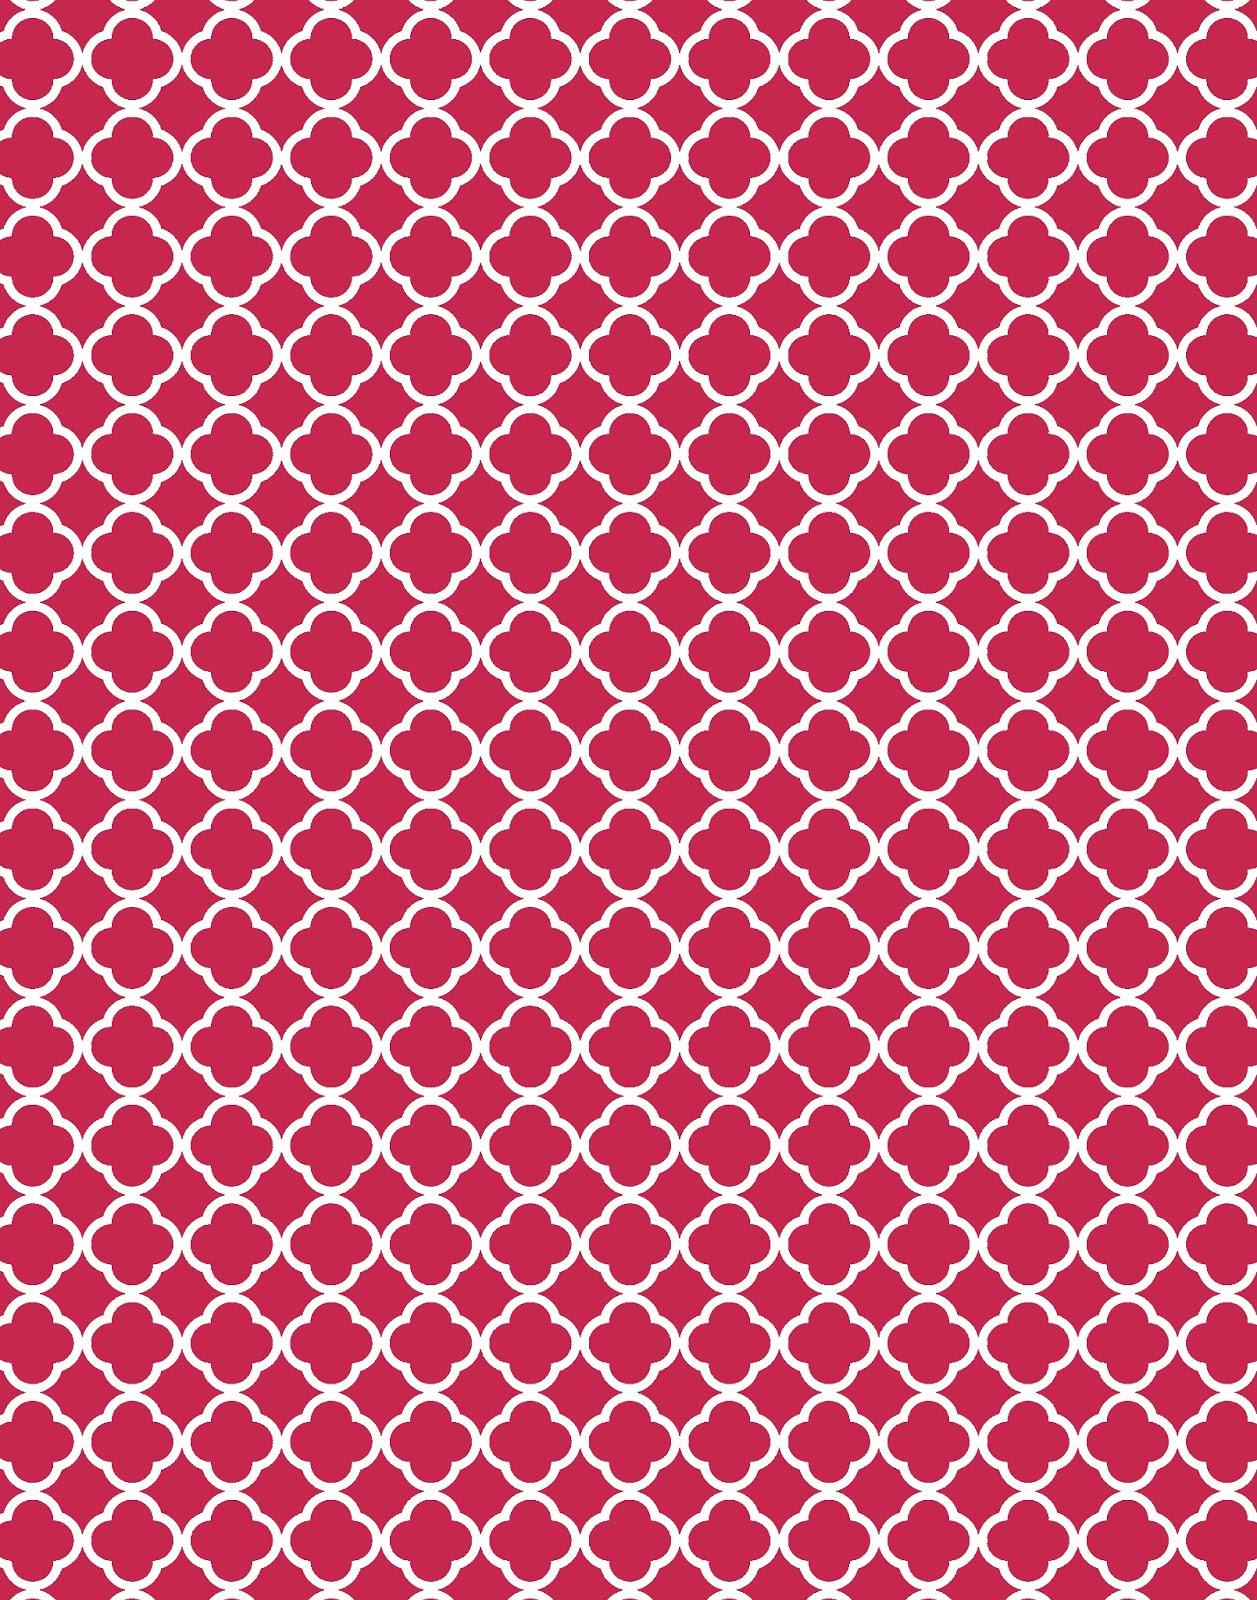 quatrefoil pattern background - photo #9